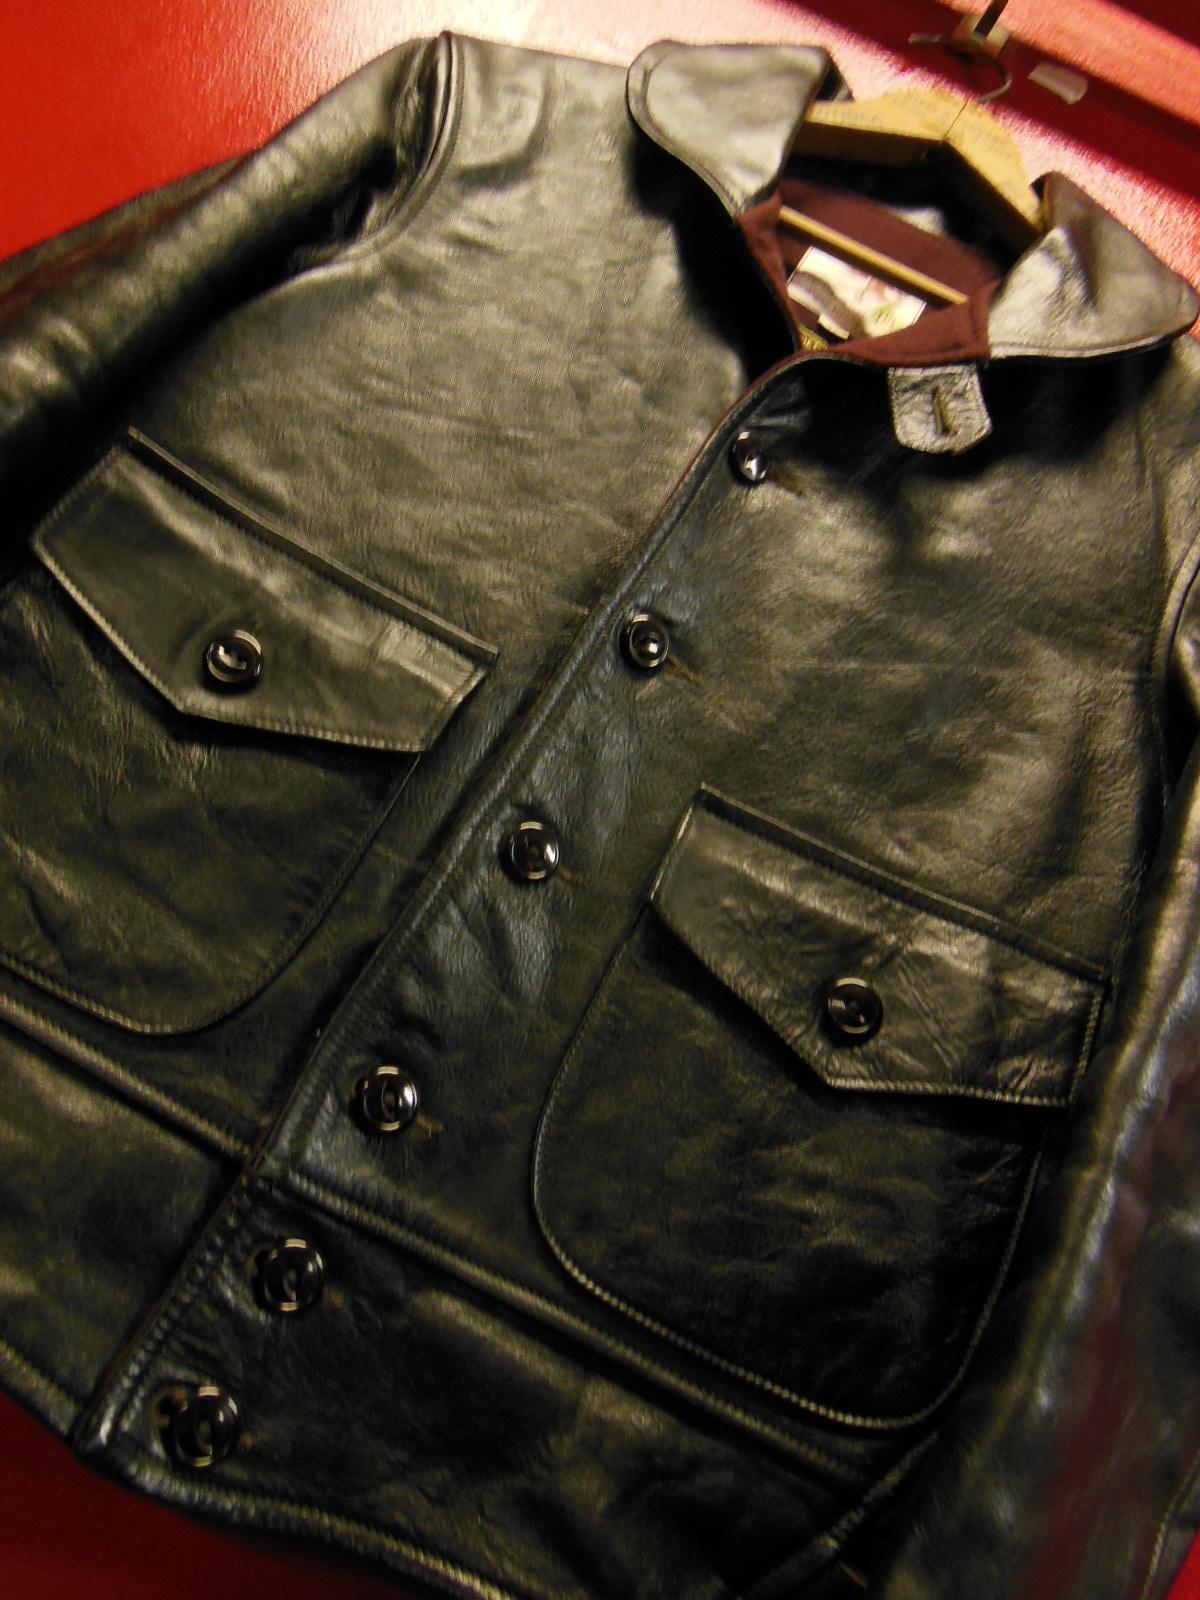 USED HIMEL BROTHERS LEATHER HERON 1929/新喜皮革製黒ホースハイド/SIZE-36/ボタンフロント A-1 ジャケット_c0187684_14574623.jpg